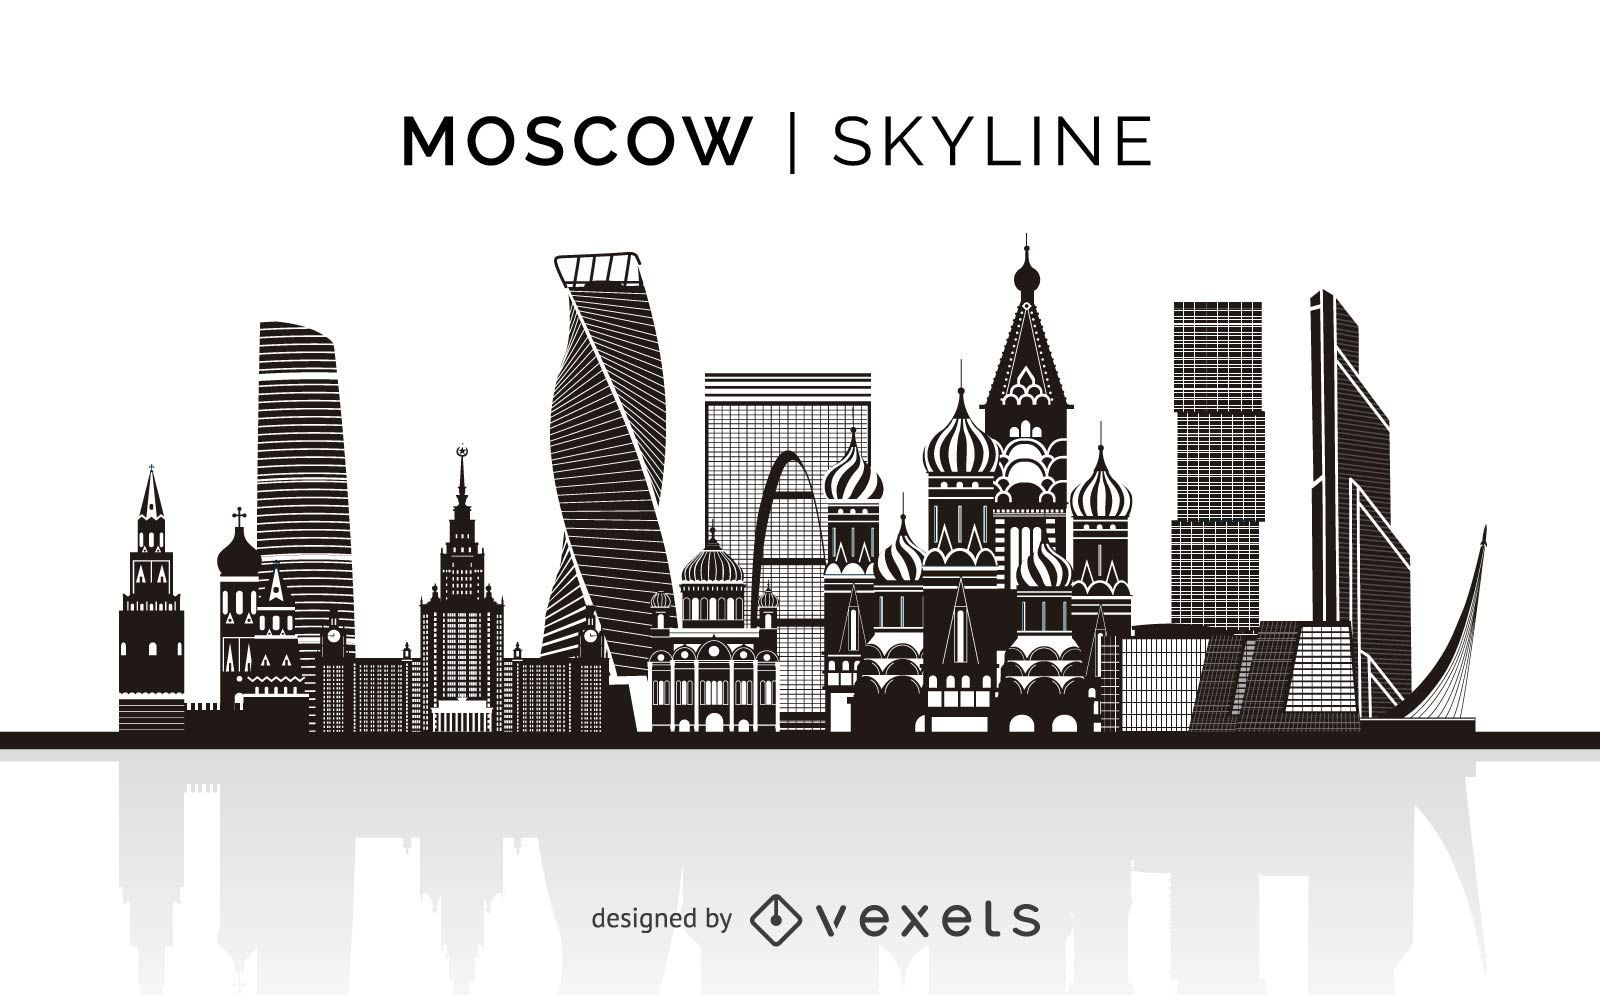 Moscow silhouette skyline